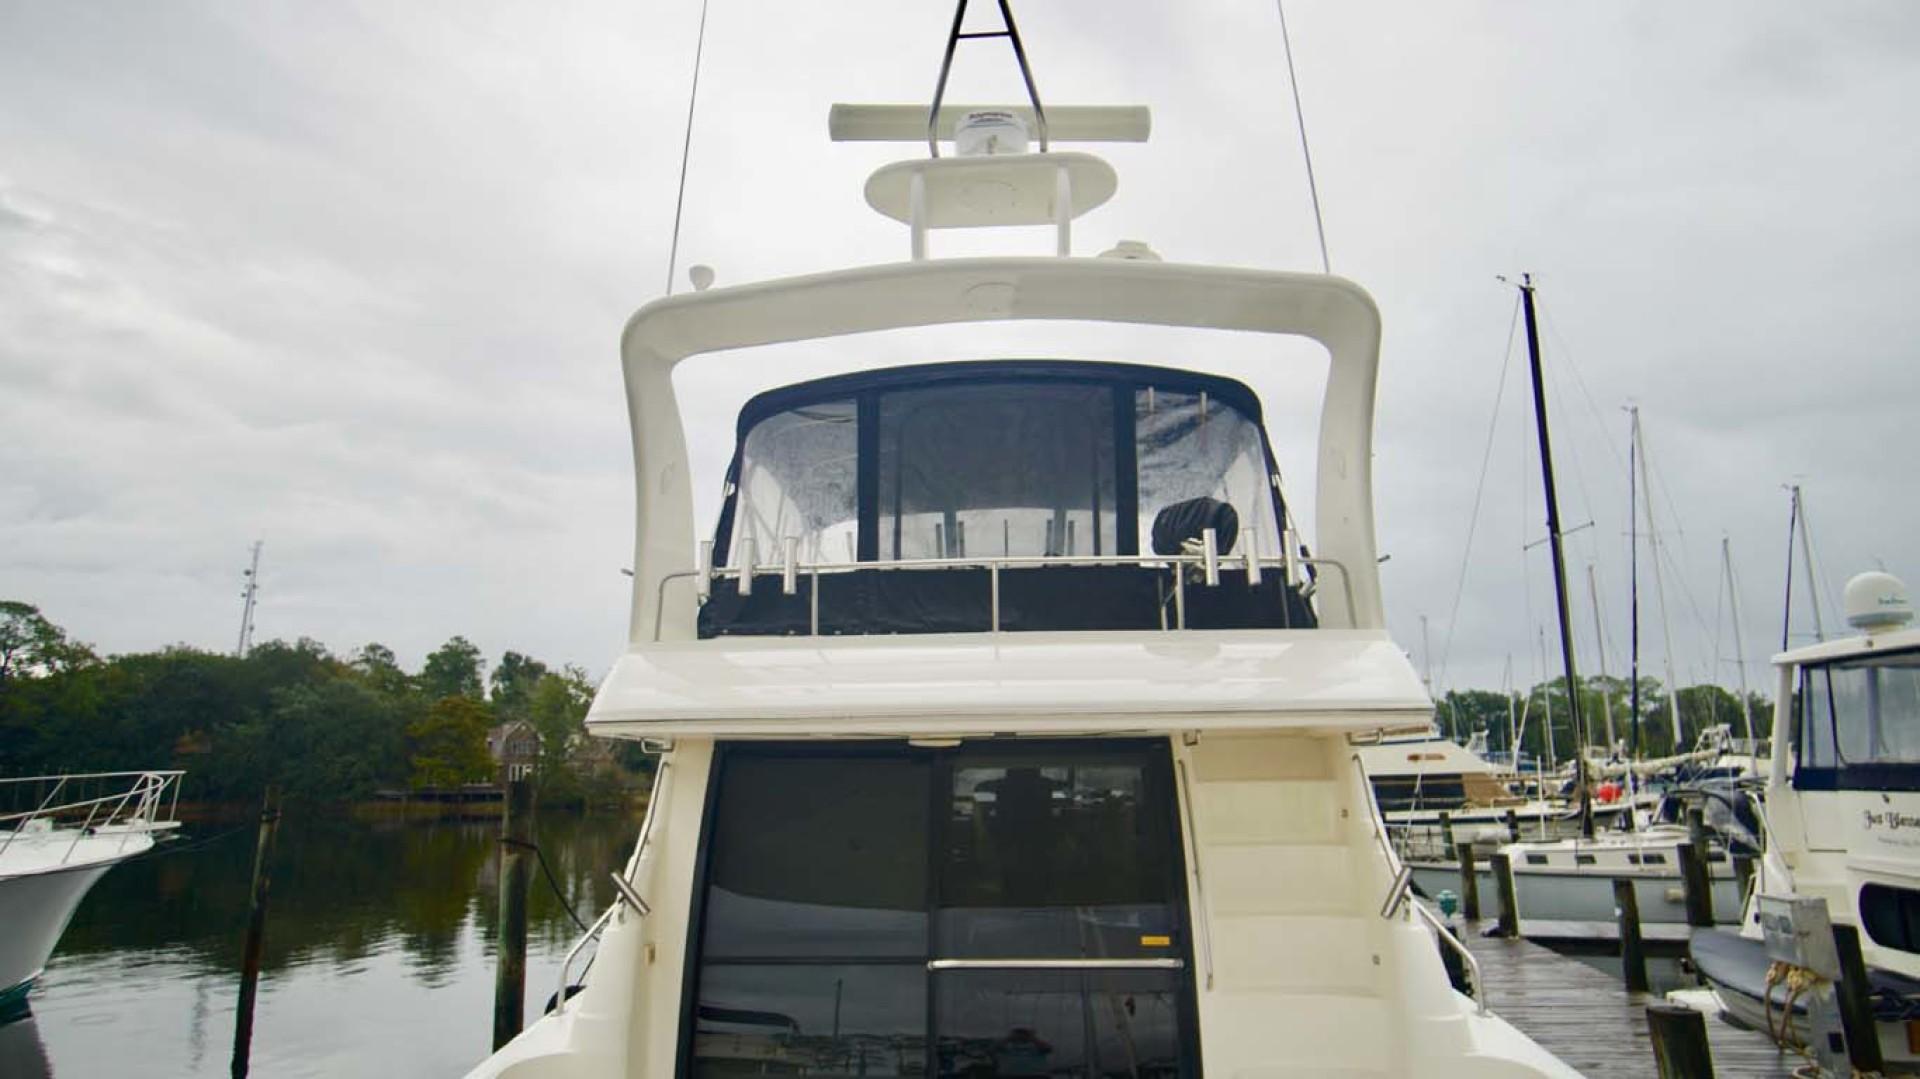 Cruisers Yachts-5000 Sport Sedan 1999-YOLO Niceville-Florida-United States-Radar Arch-1092862 | Thumbnail